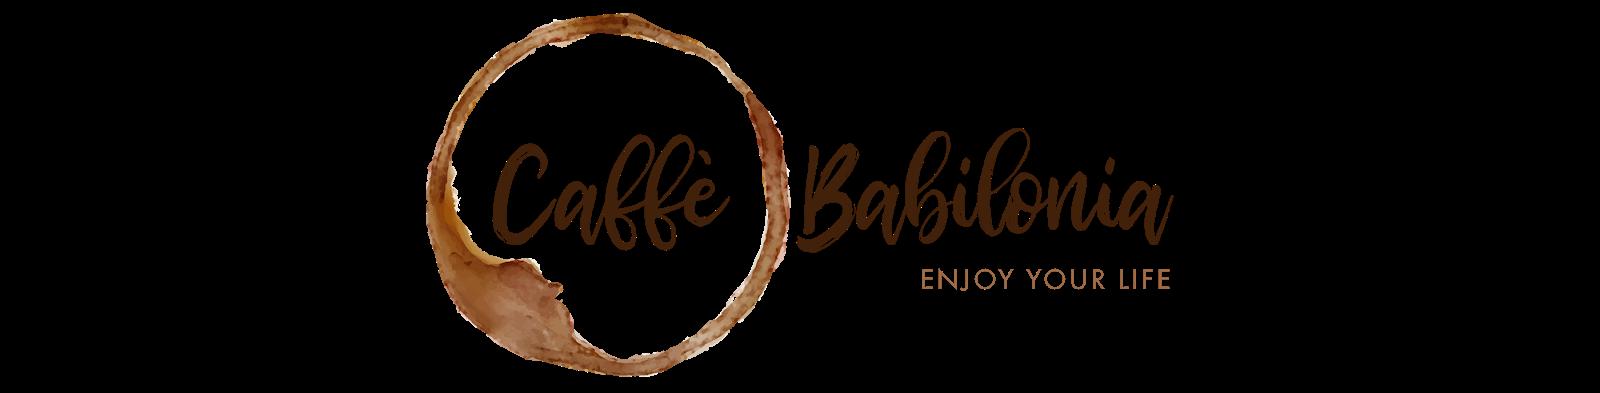 Caffè Babilonia